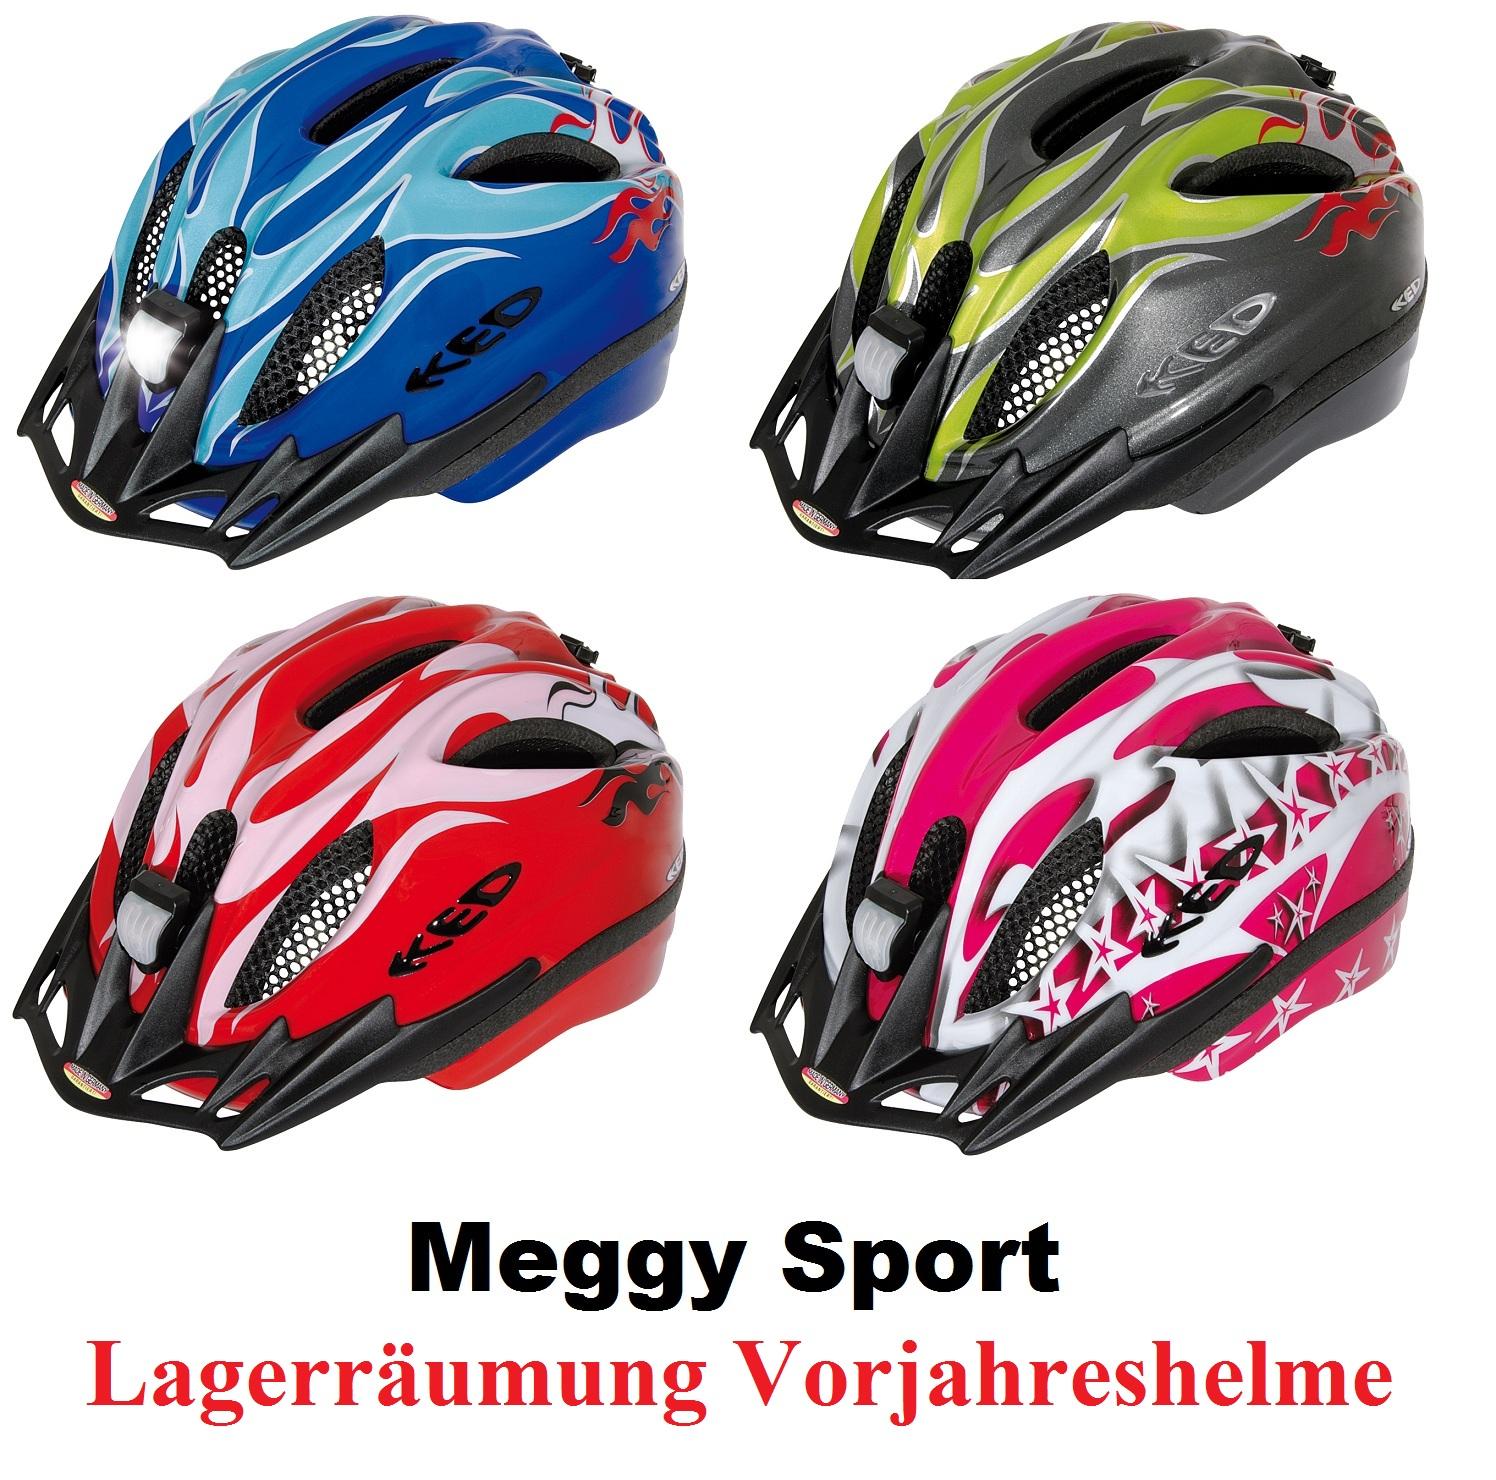 KED Fahrradhelm Meggy Sport II Skaterhelm Helm